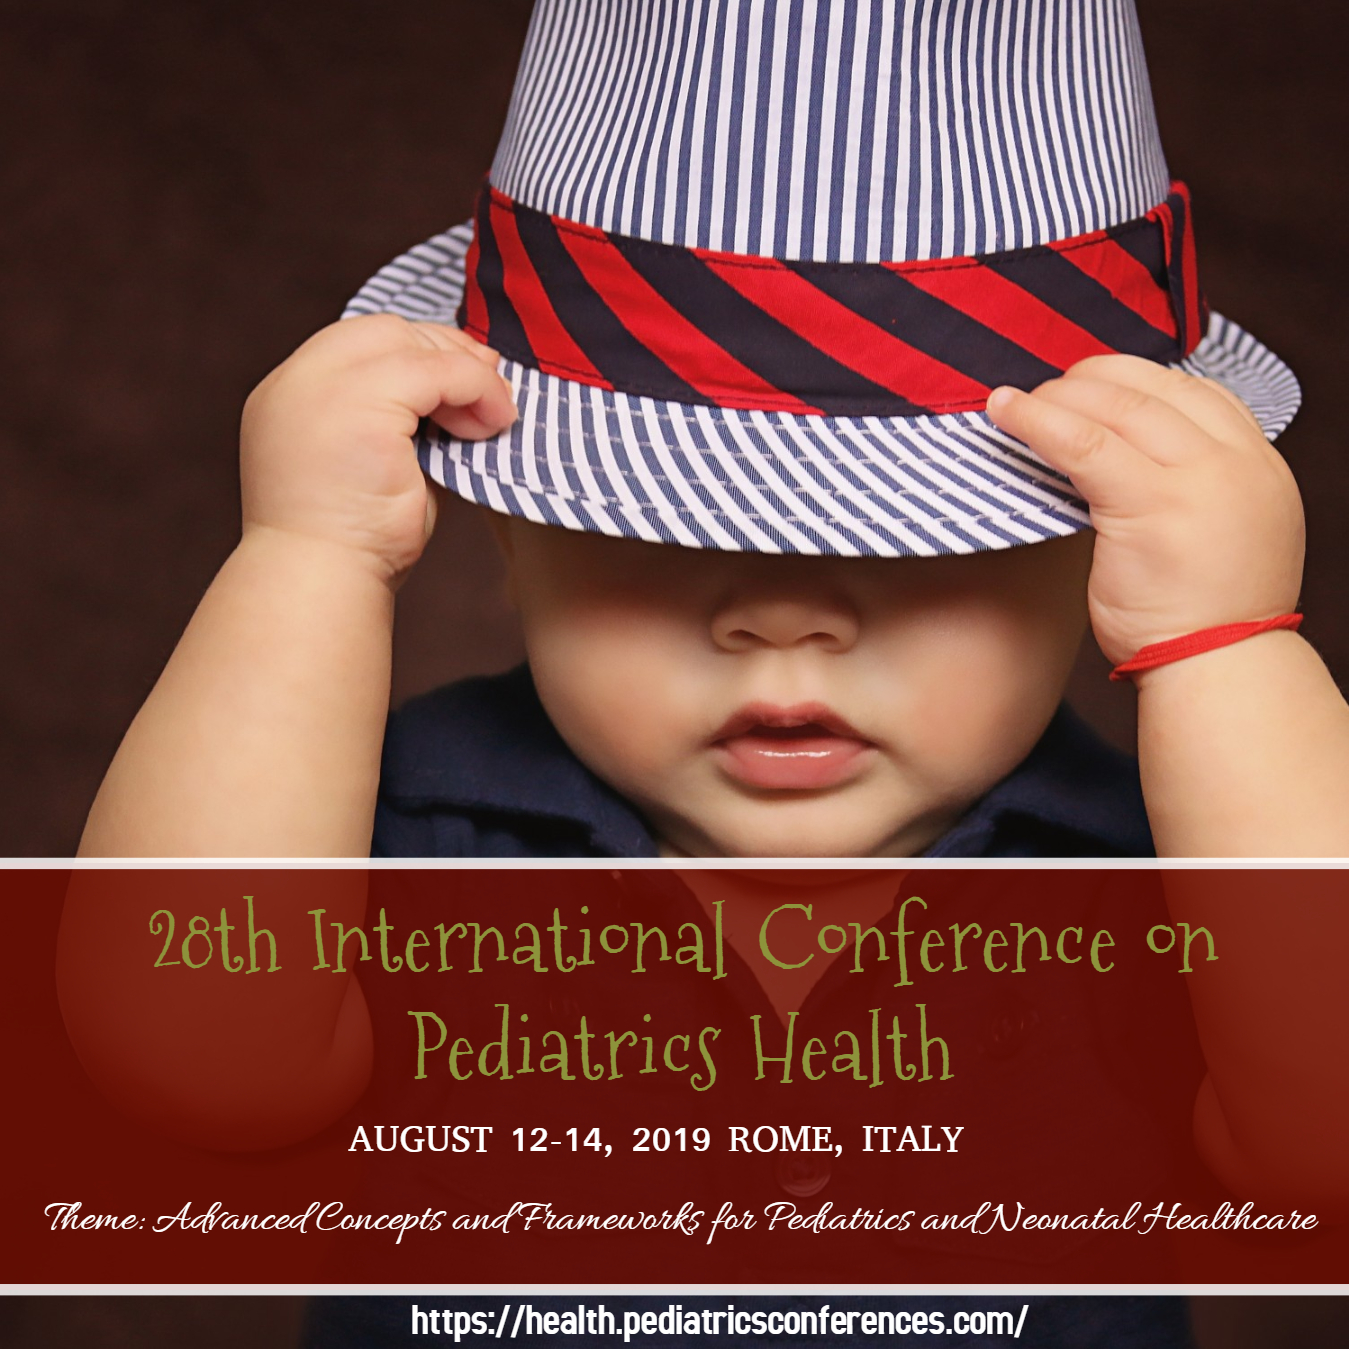 28th International Conference on Pediatrics Health, Rome, Italy